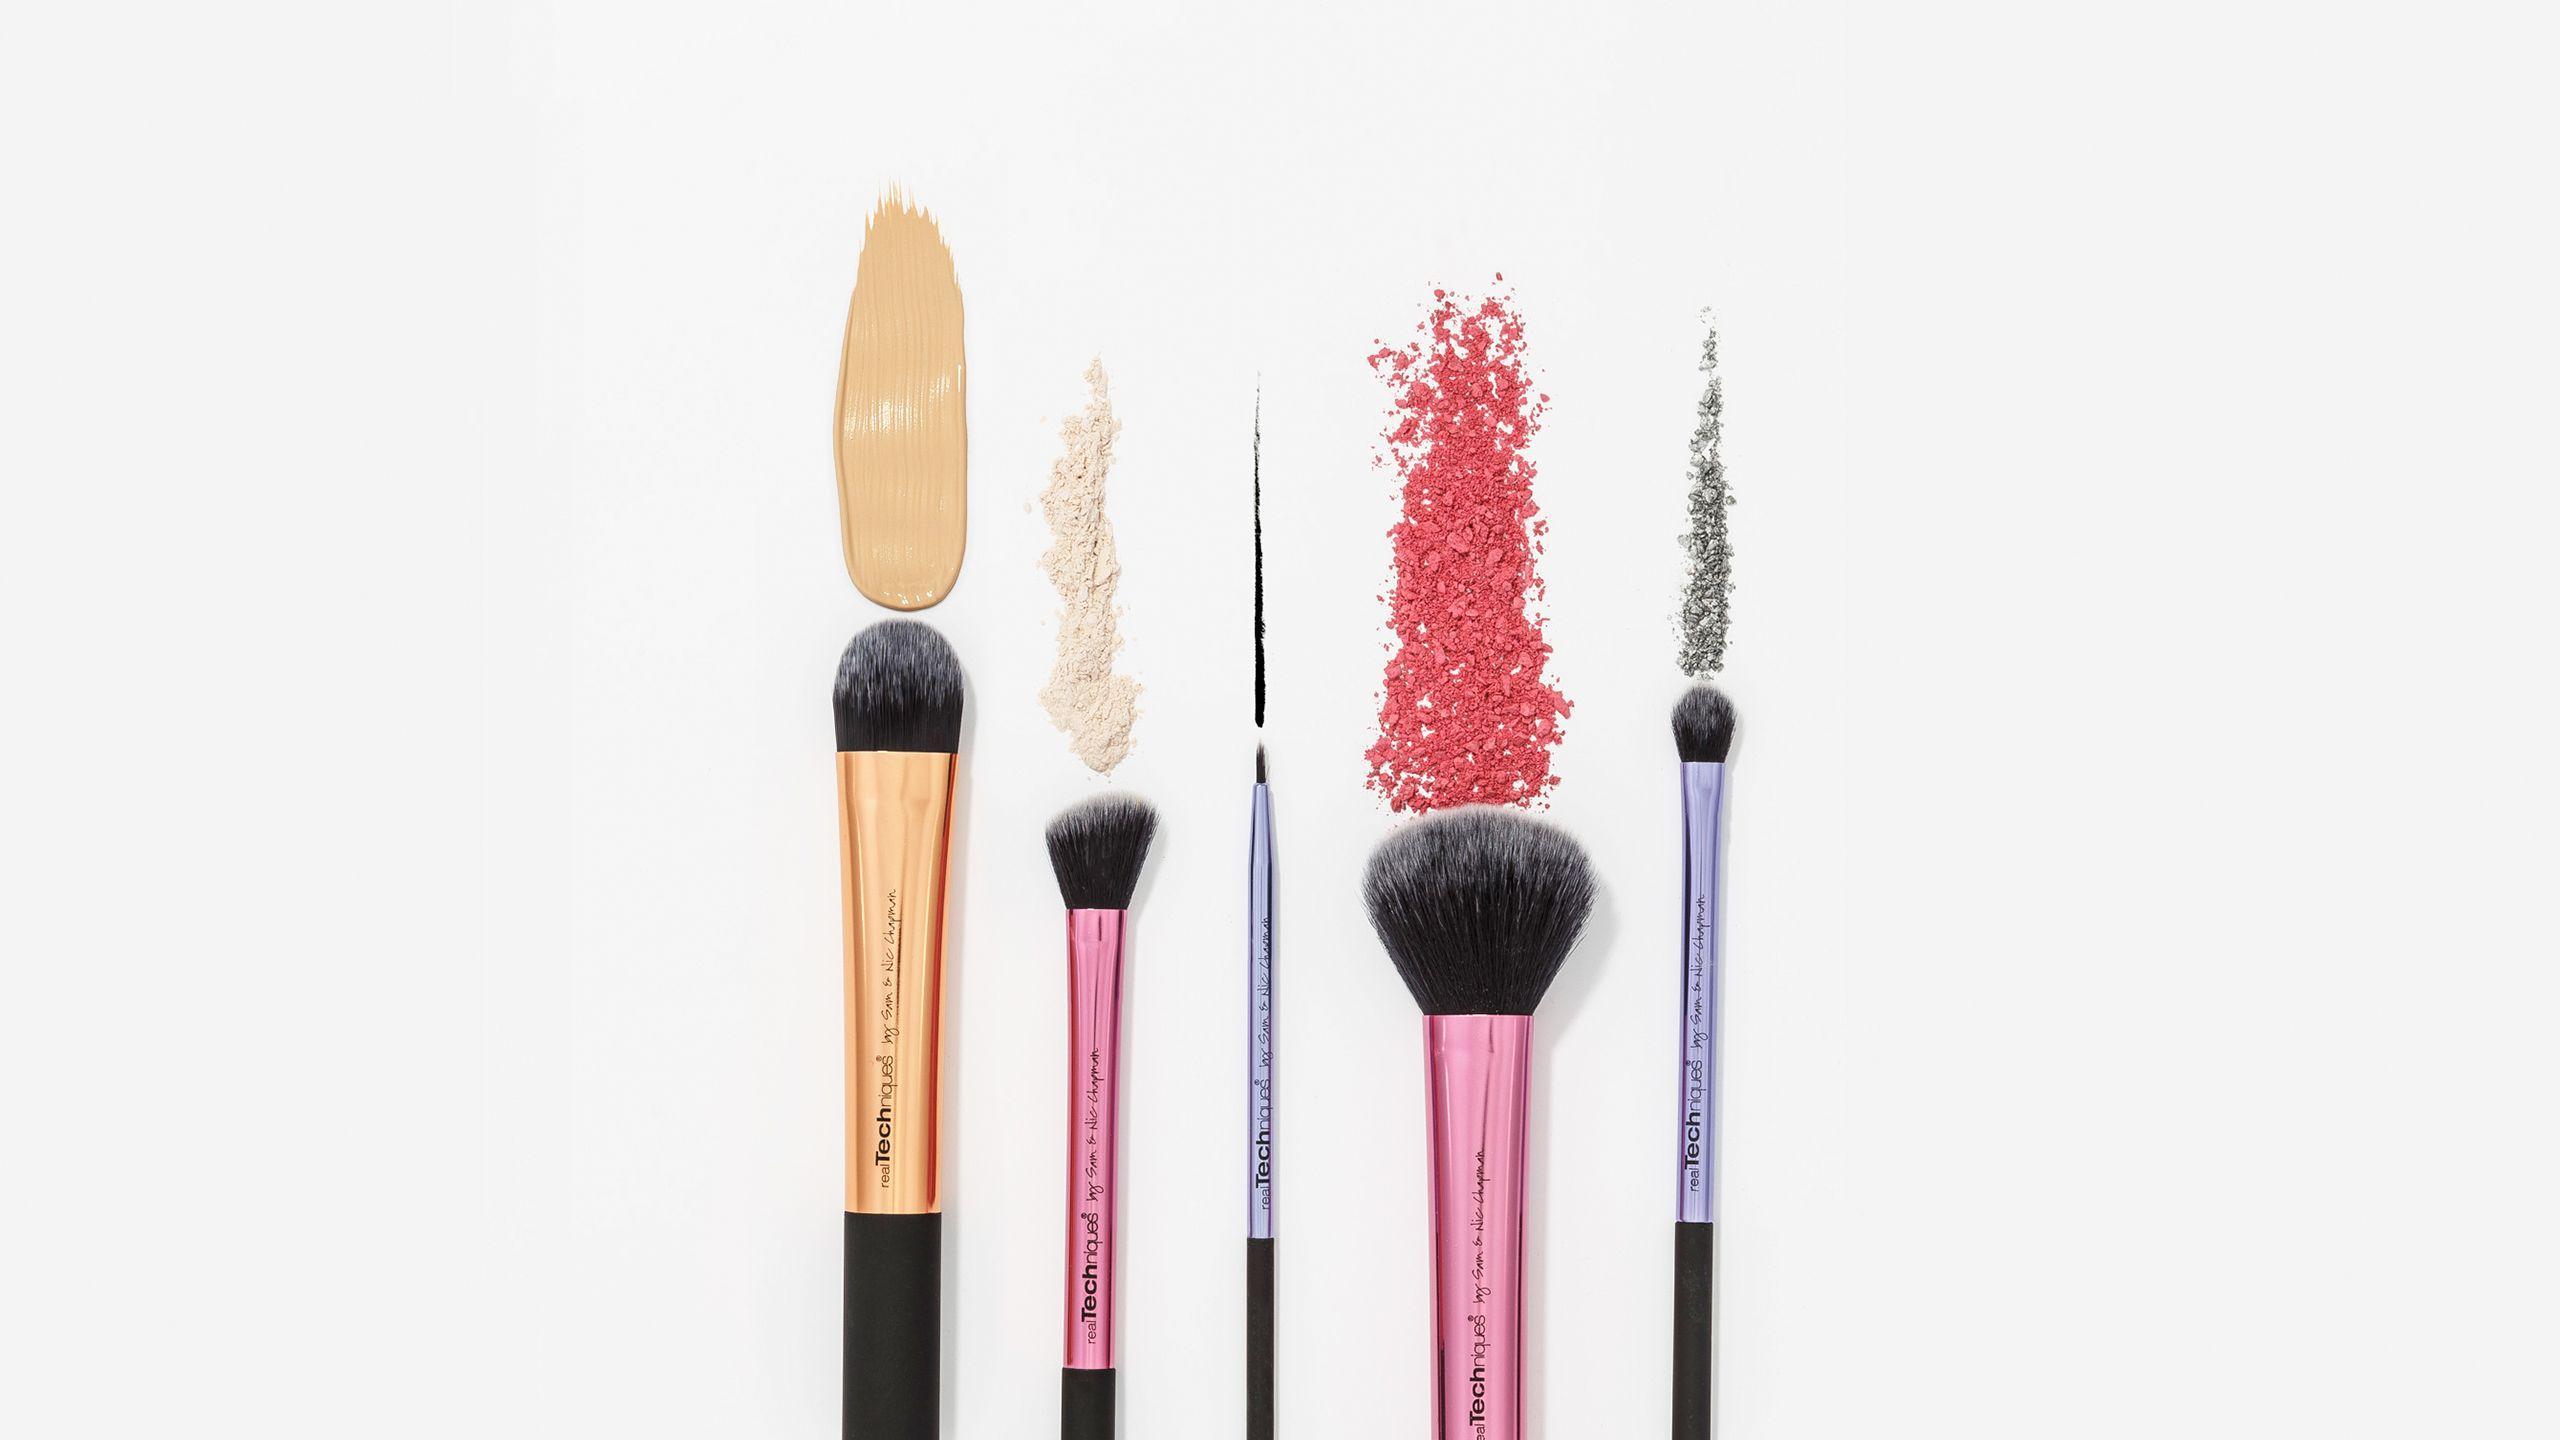 Makeup Brushes Wallpapers , Top Free Makeup Brushes